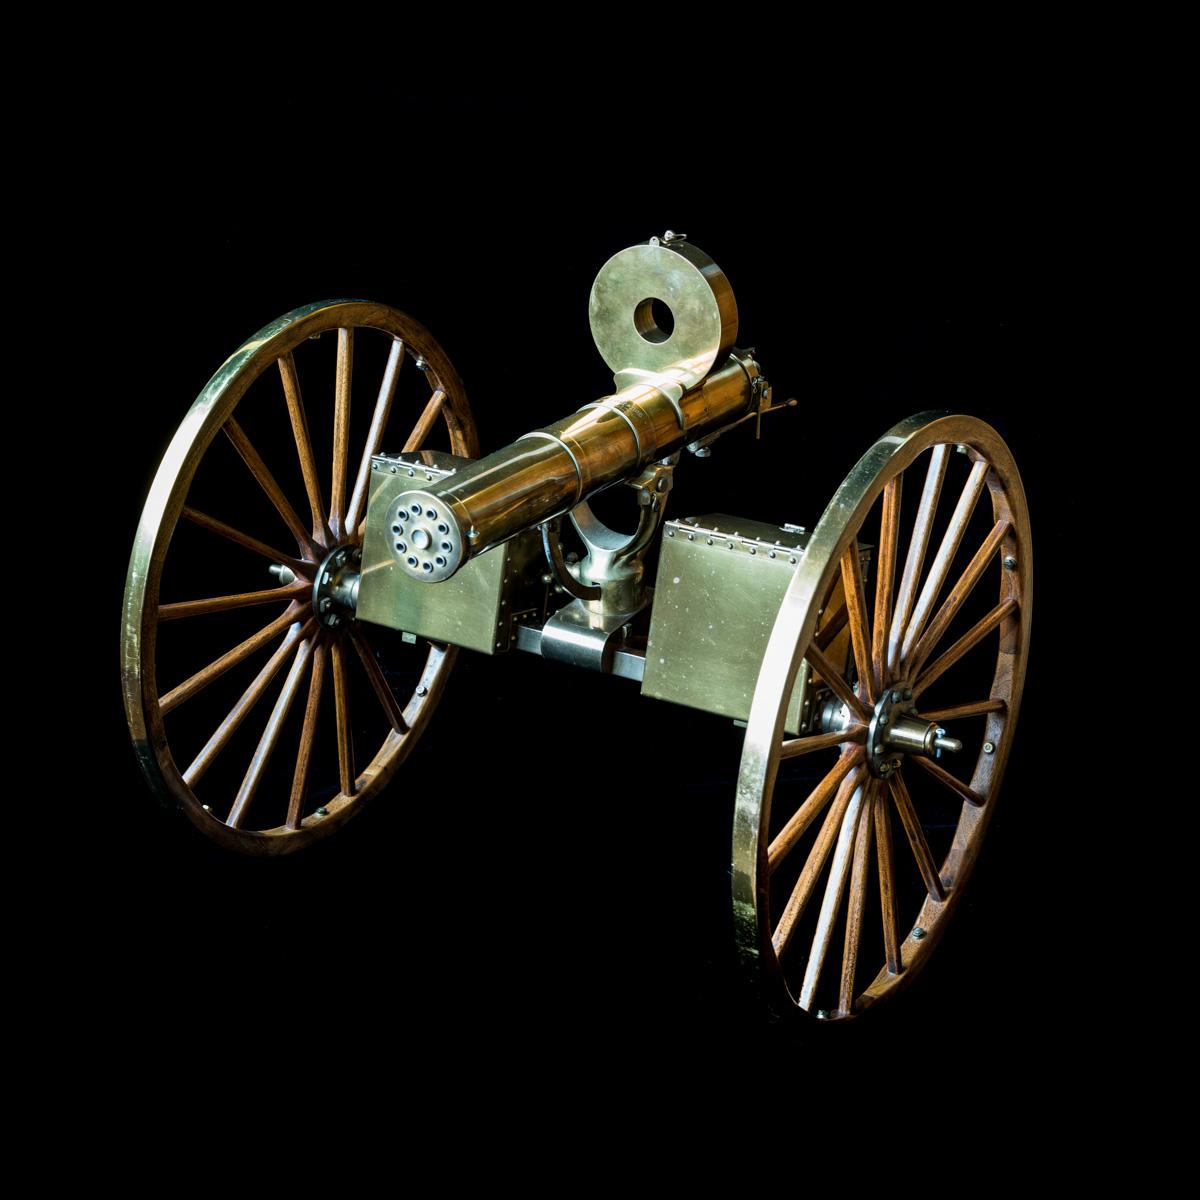 Gatling Gun 1-3rd size model-9